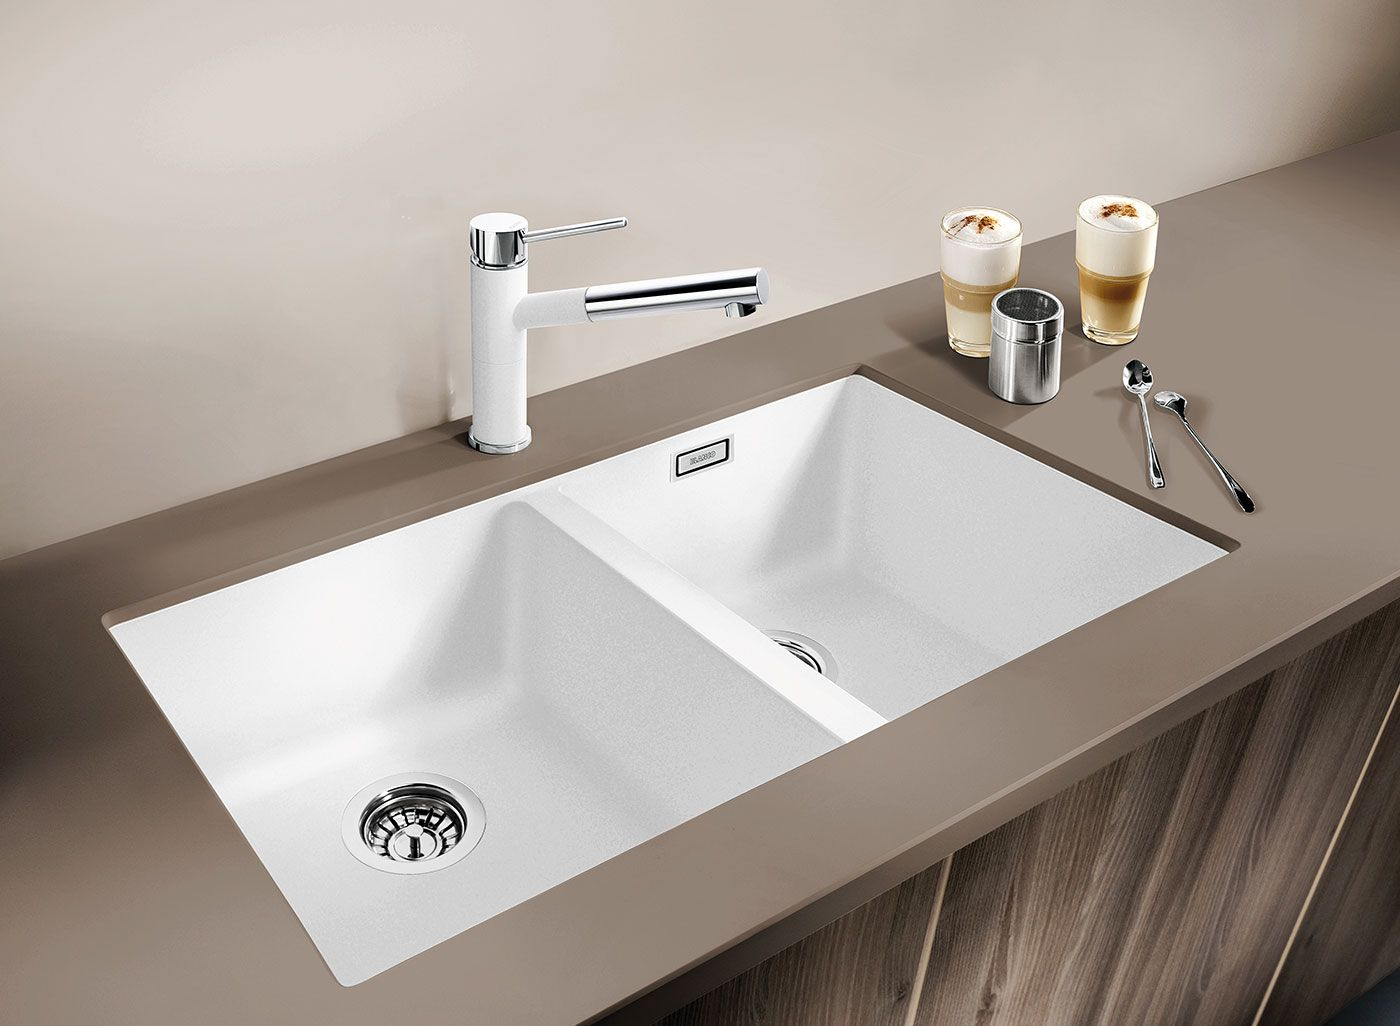 Silgranit Double Bowl Undermount Sink White in 2019